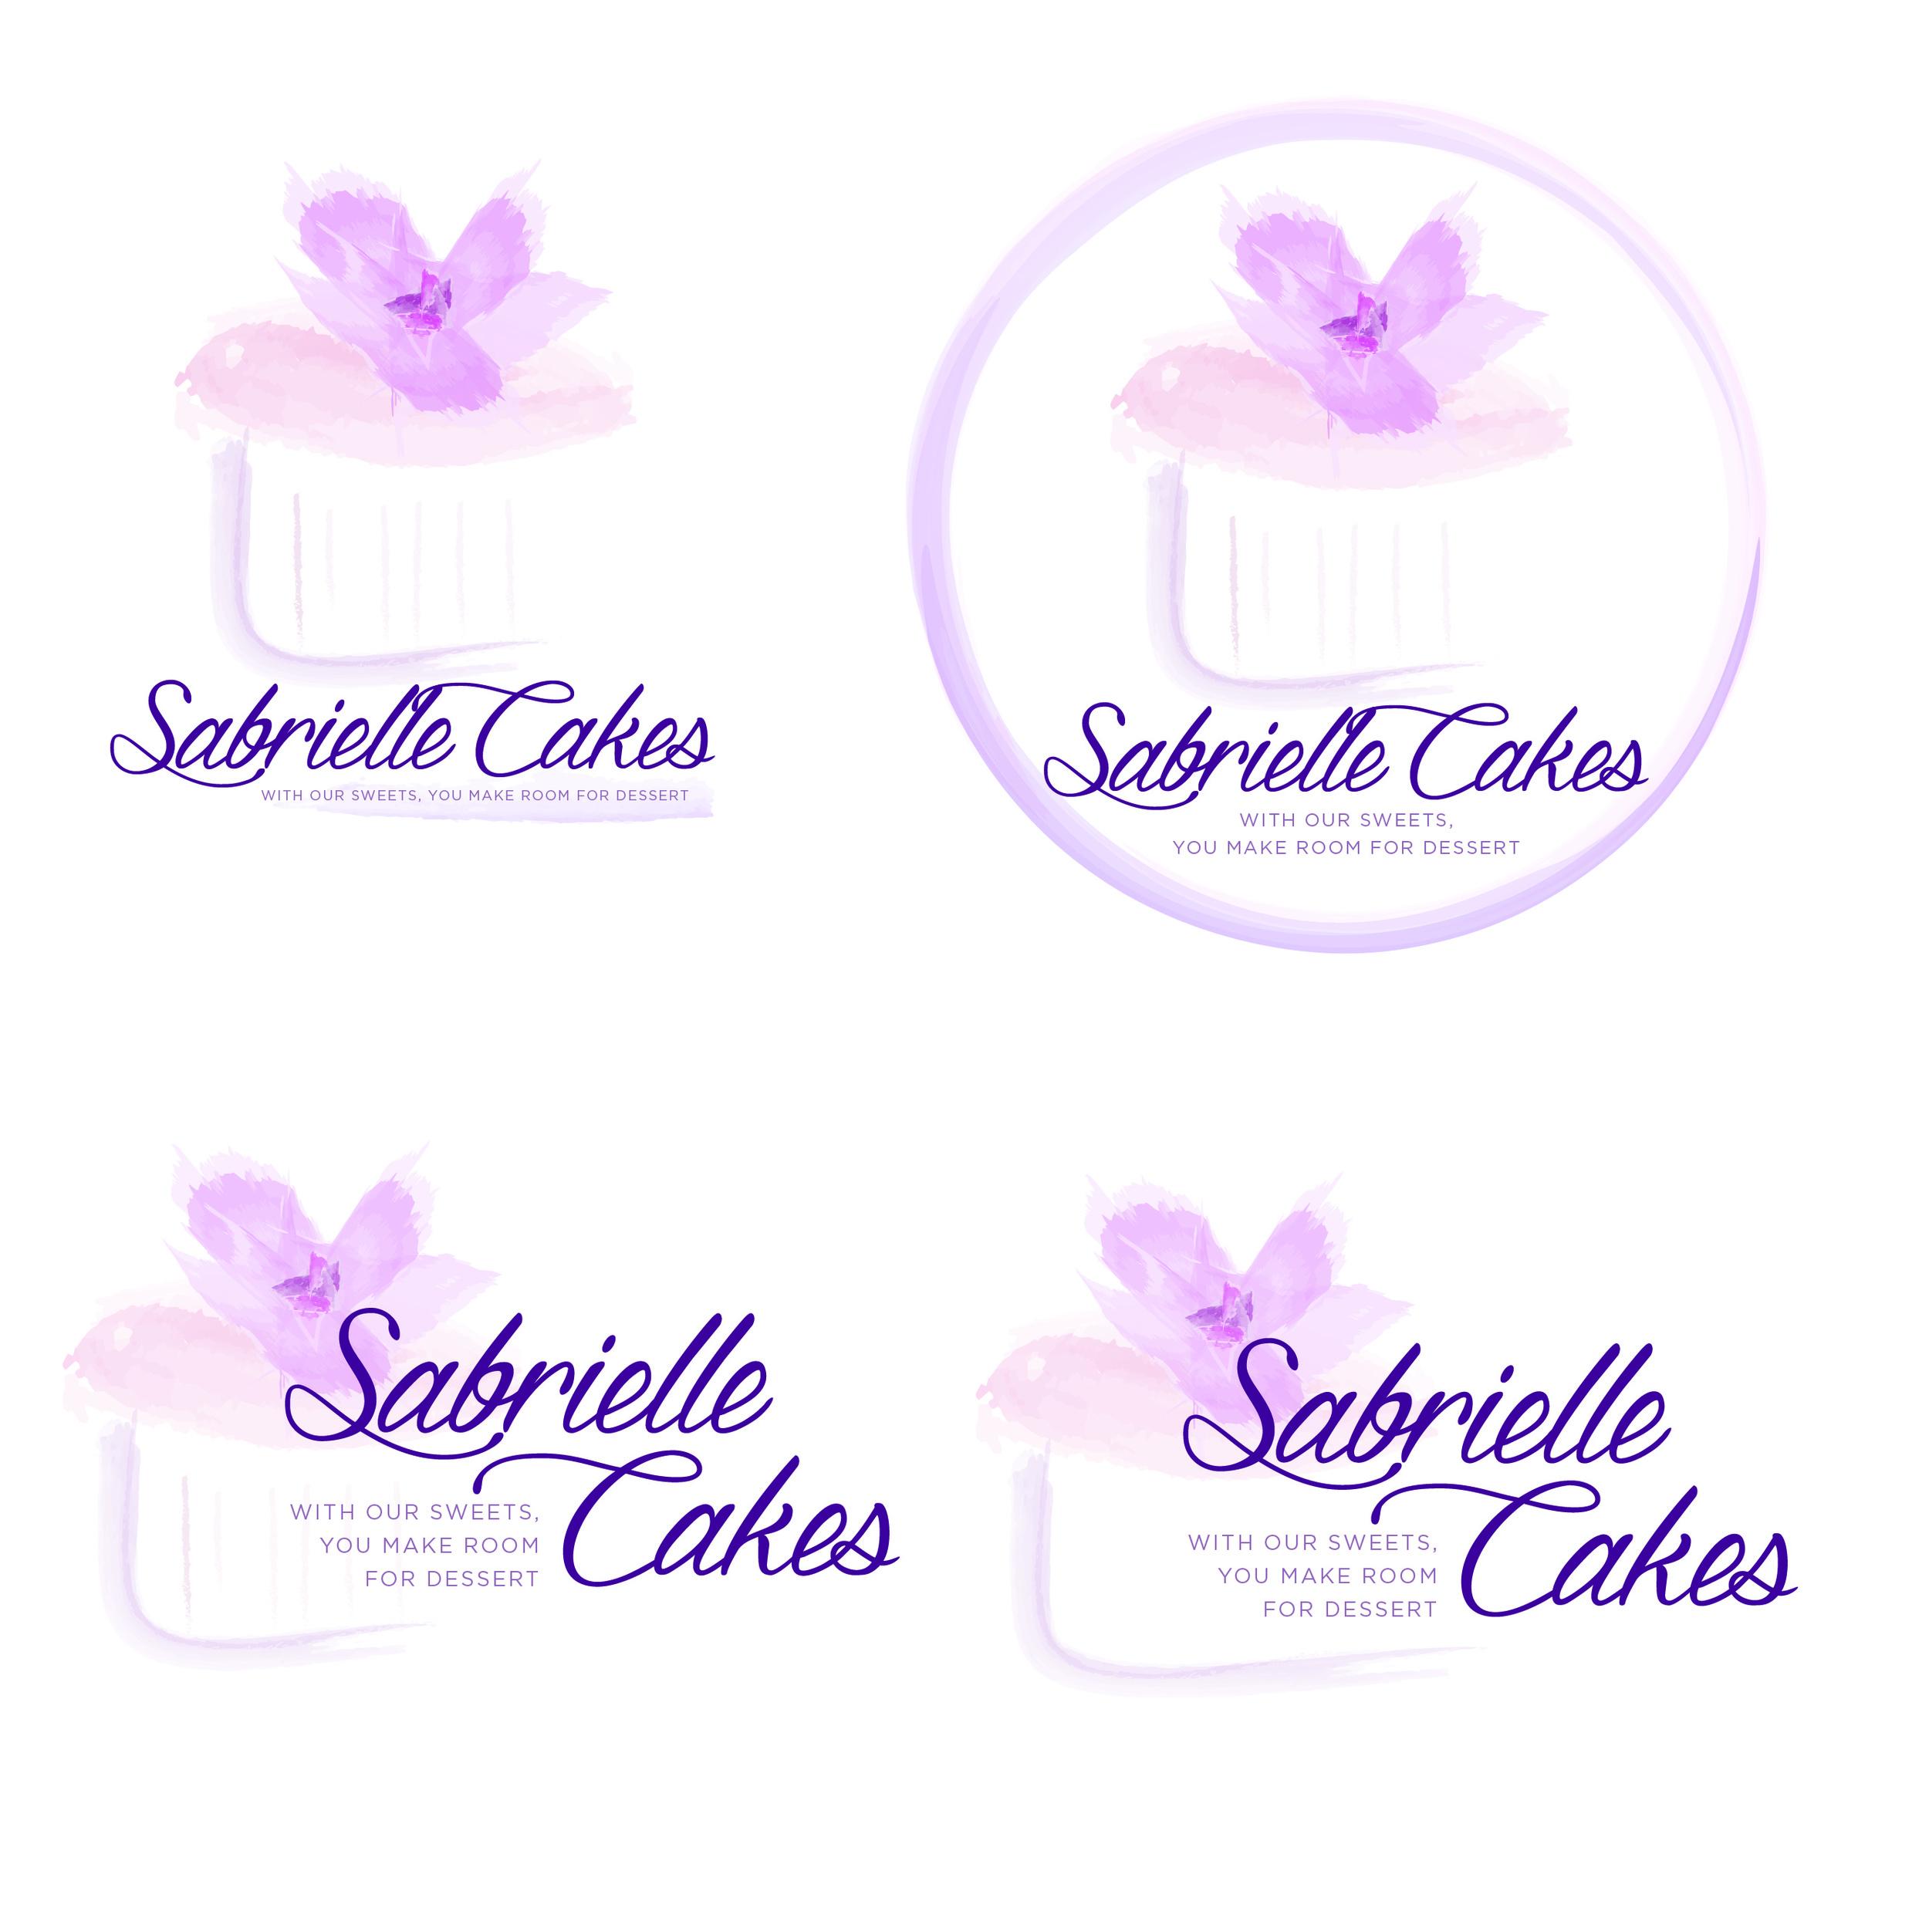 sabrielle-cakes-logo-brand-design